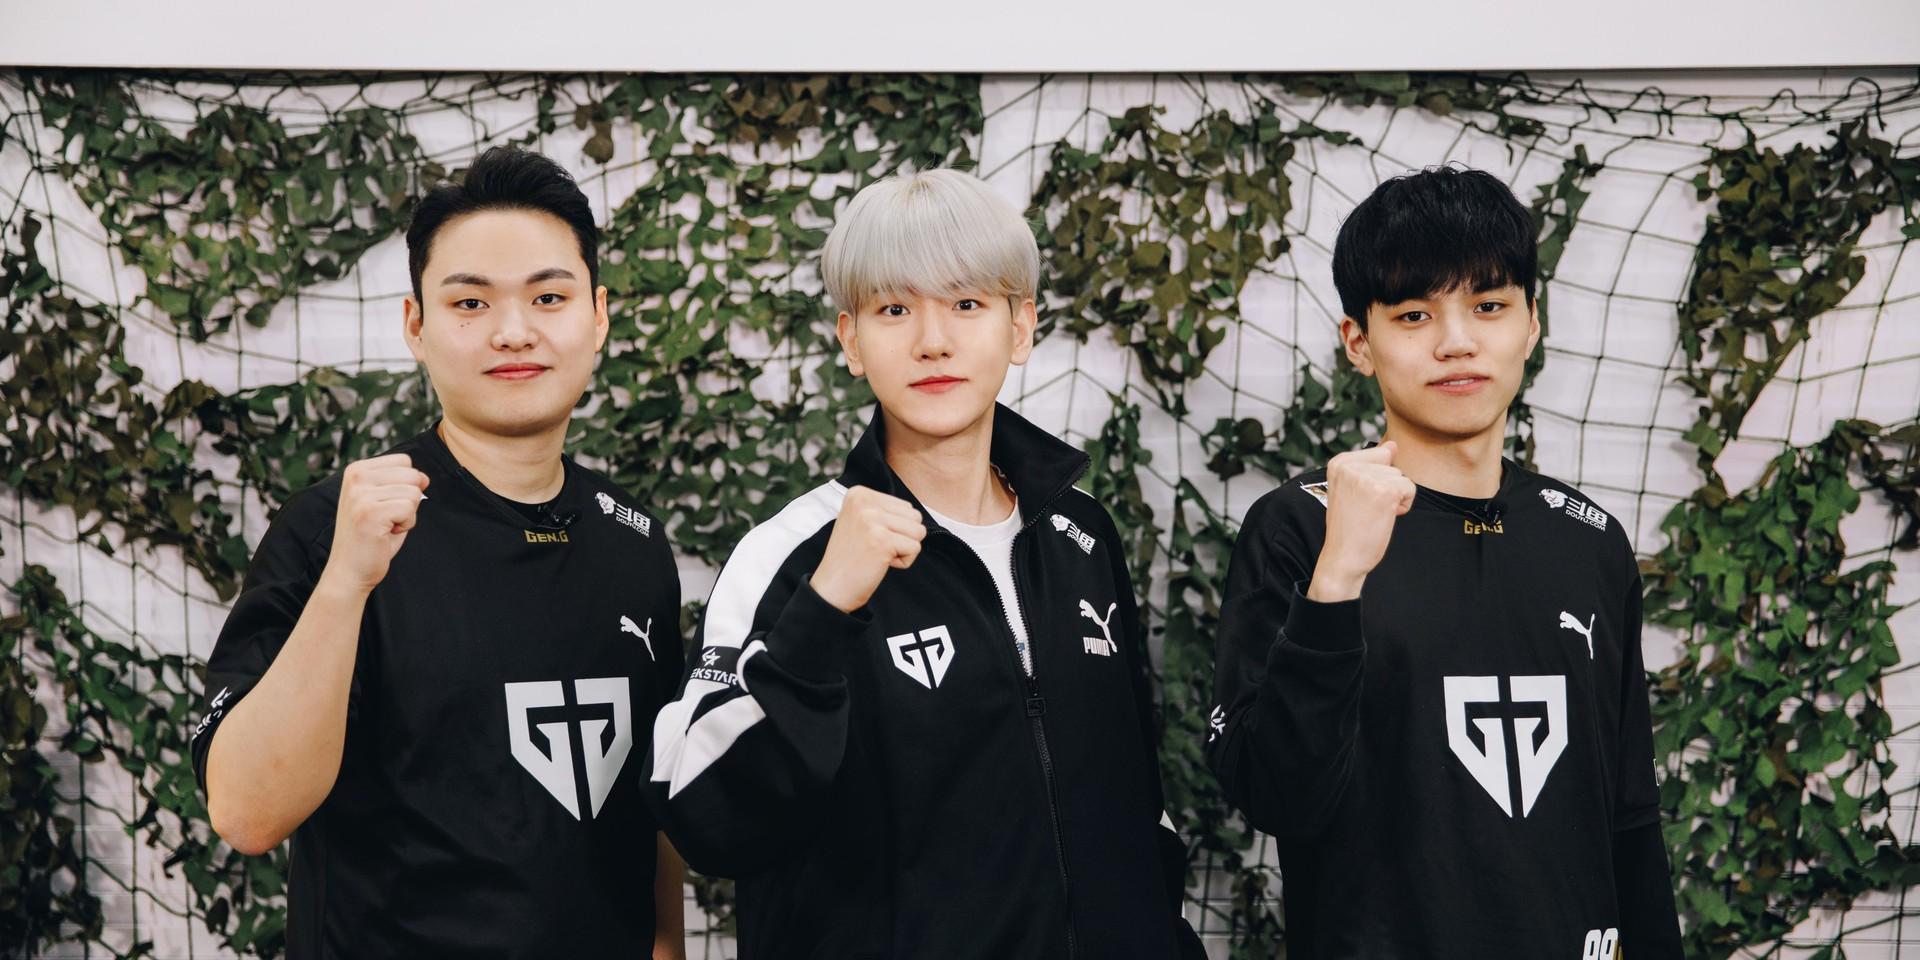 EXO's Baekhyun collaboration with Gen.G esports on PUBG livestream breaks over 500,000 views